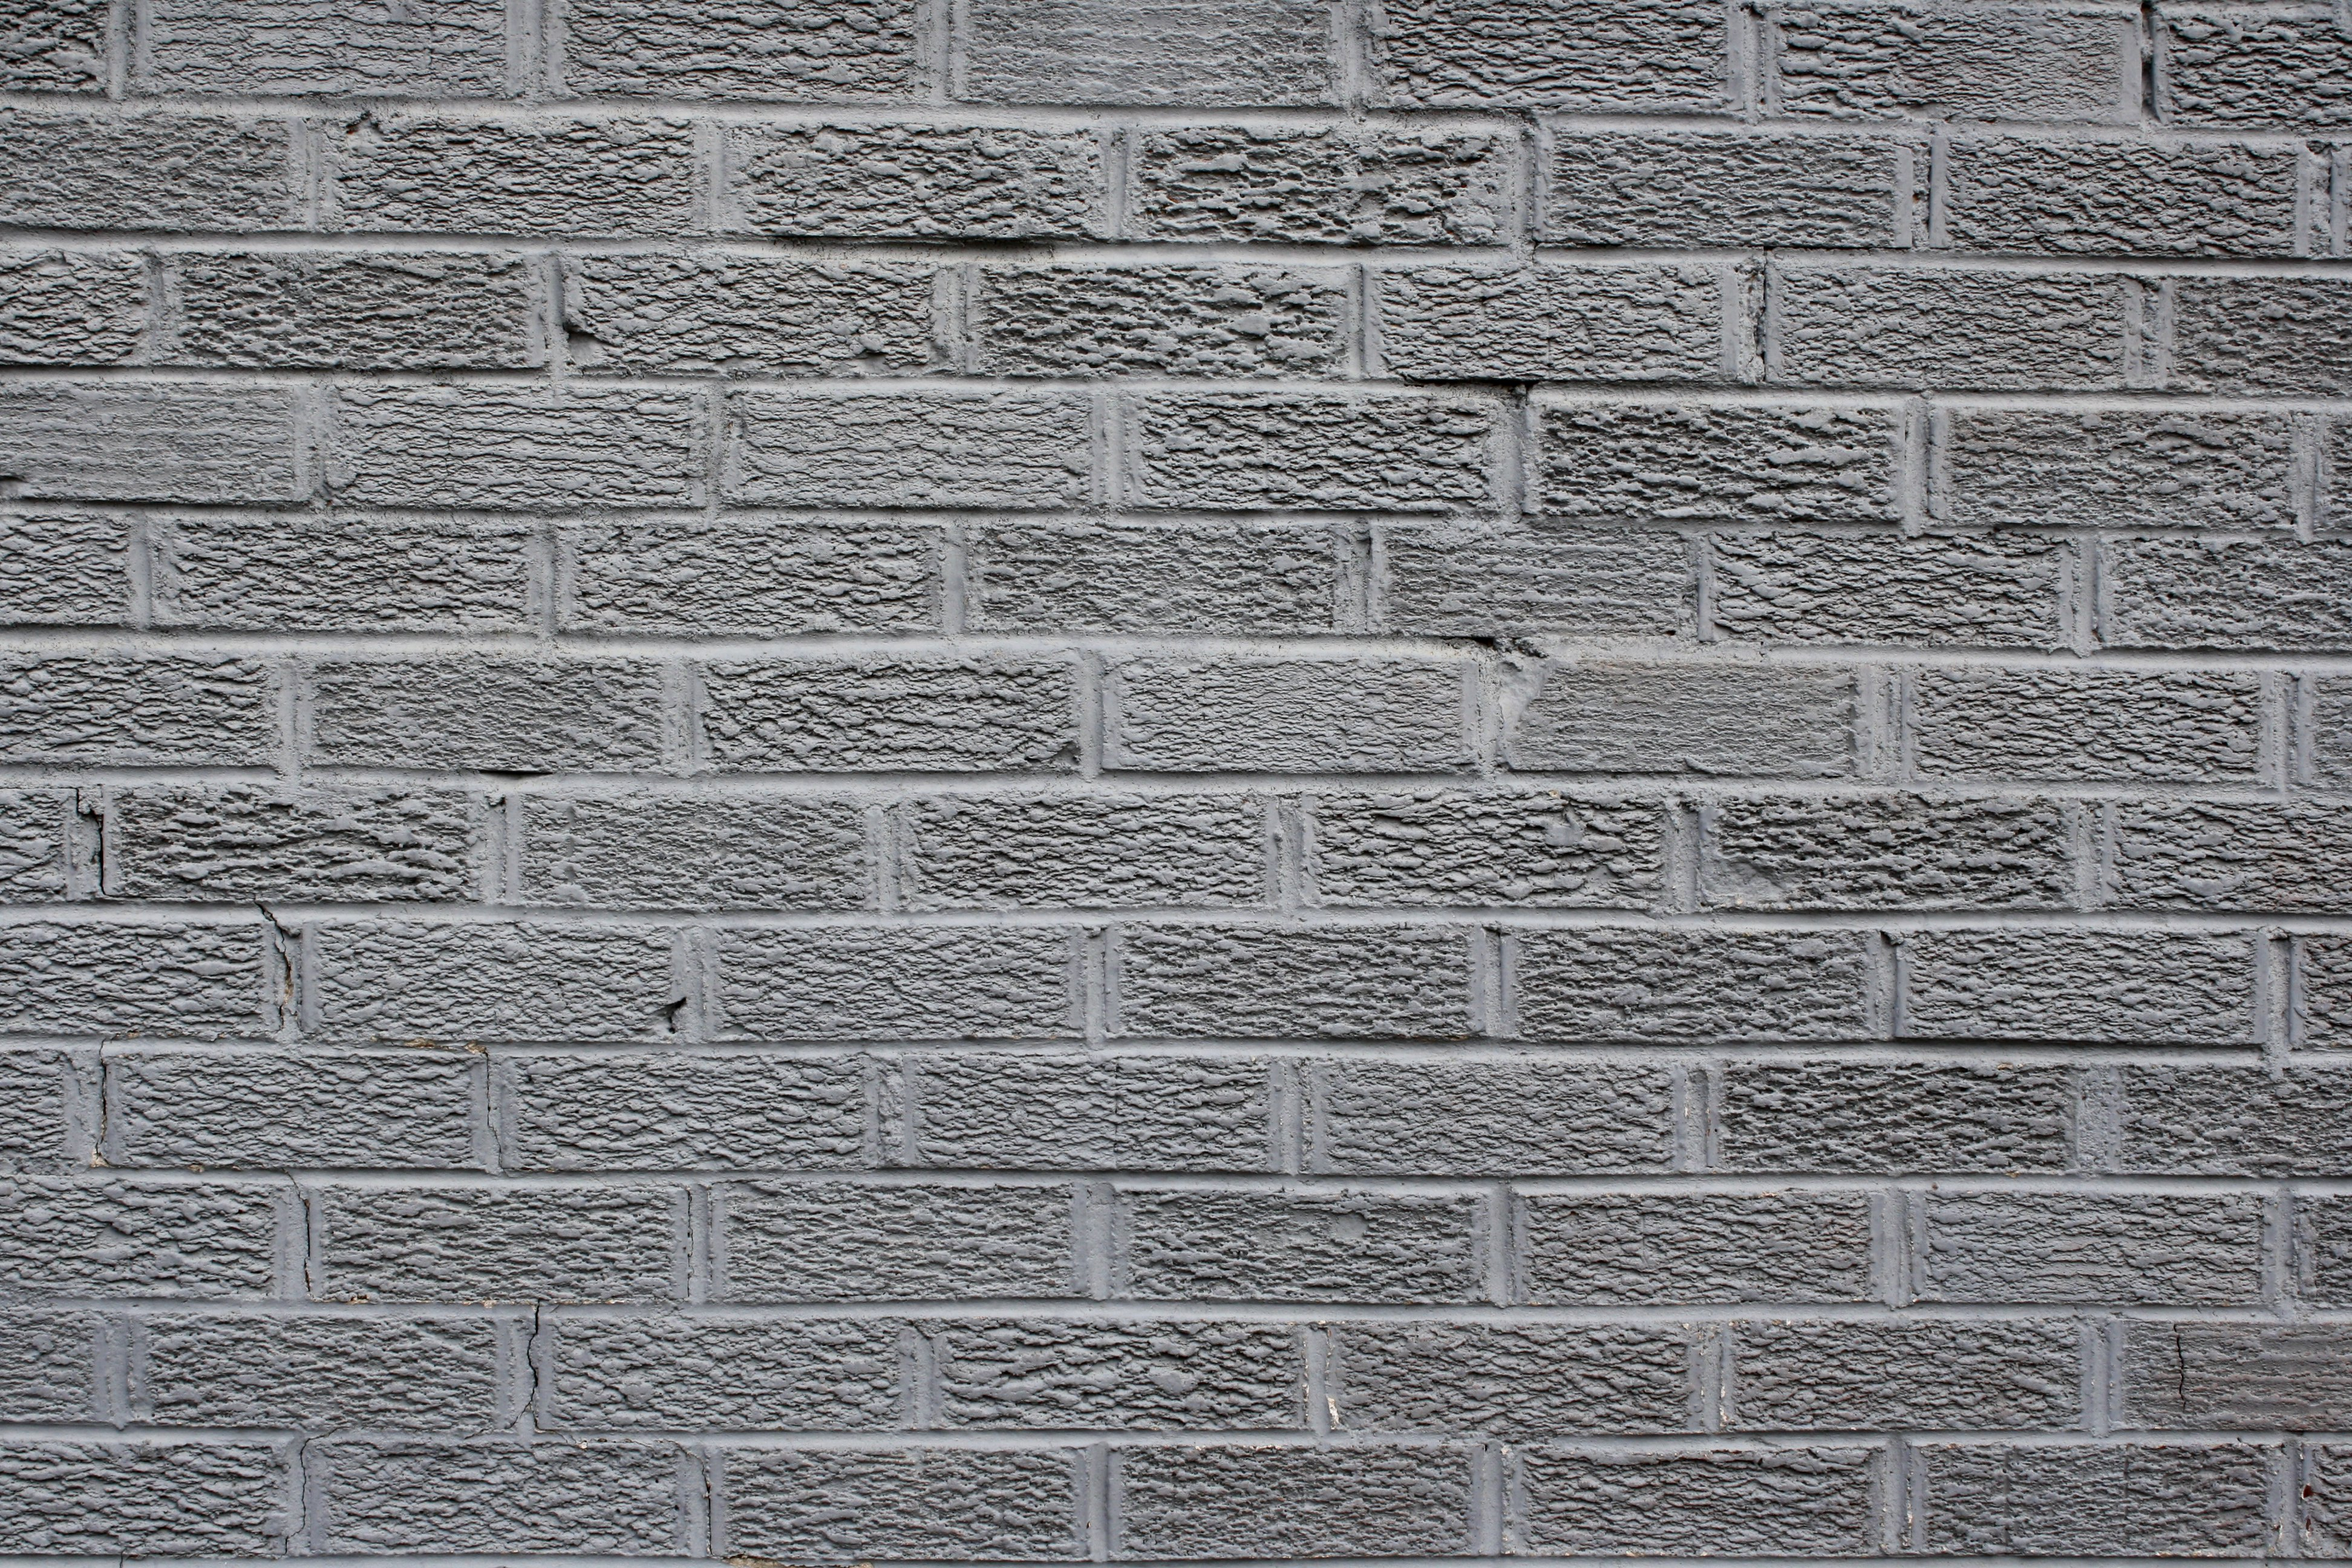 Gray Brick Wall Texture Picture Photograph Photos Public 3888x2592